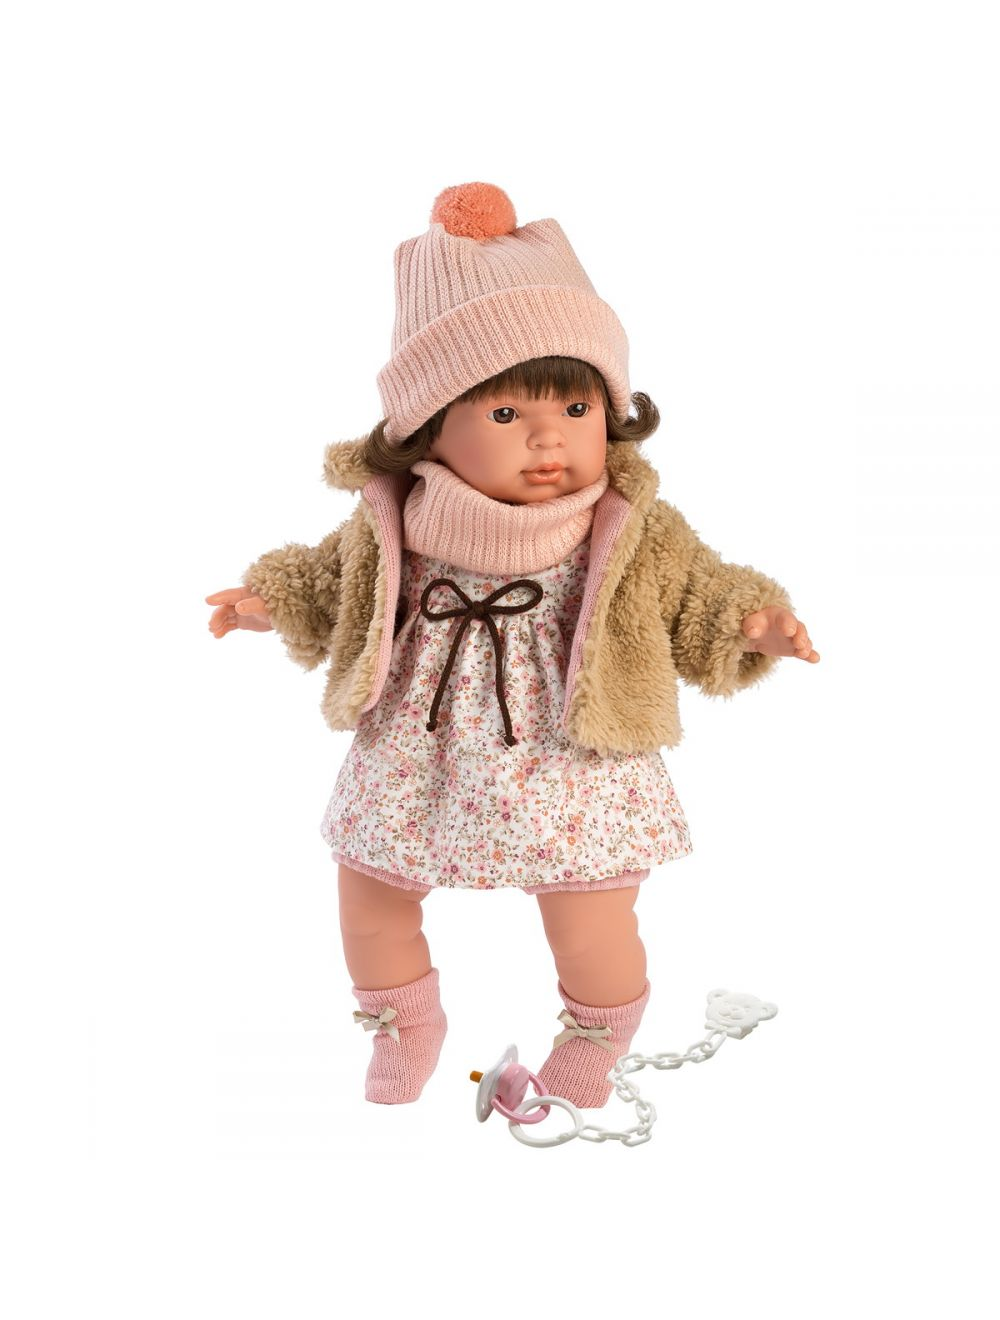 Llorens 42152 Lalka płacząca Pippa 42 cm brunetka beżowe futerko